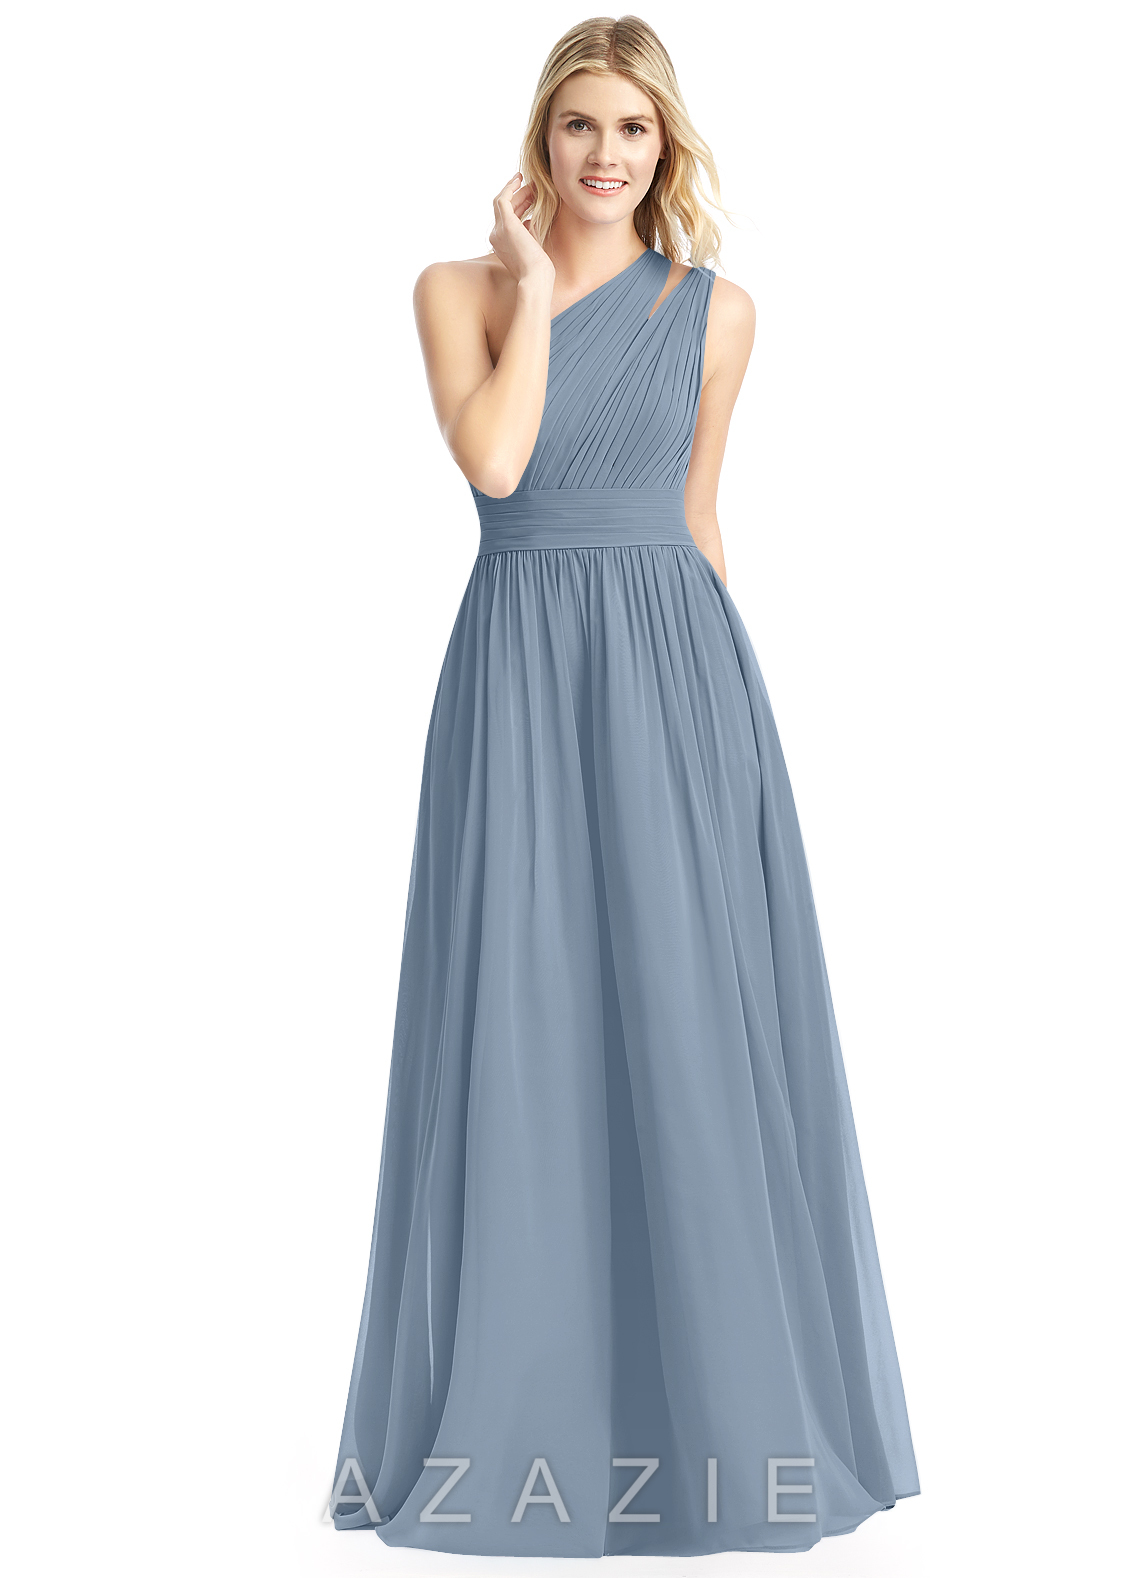 Azazie molly bridesmaid dress azazie loading zoom ombrellifo Choice Image